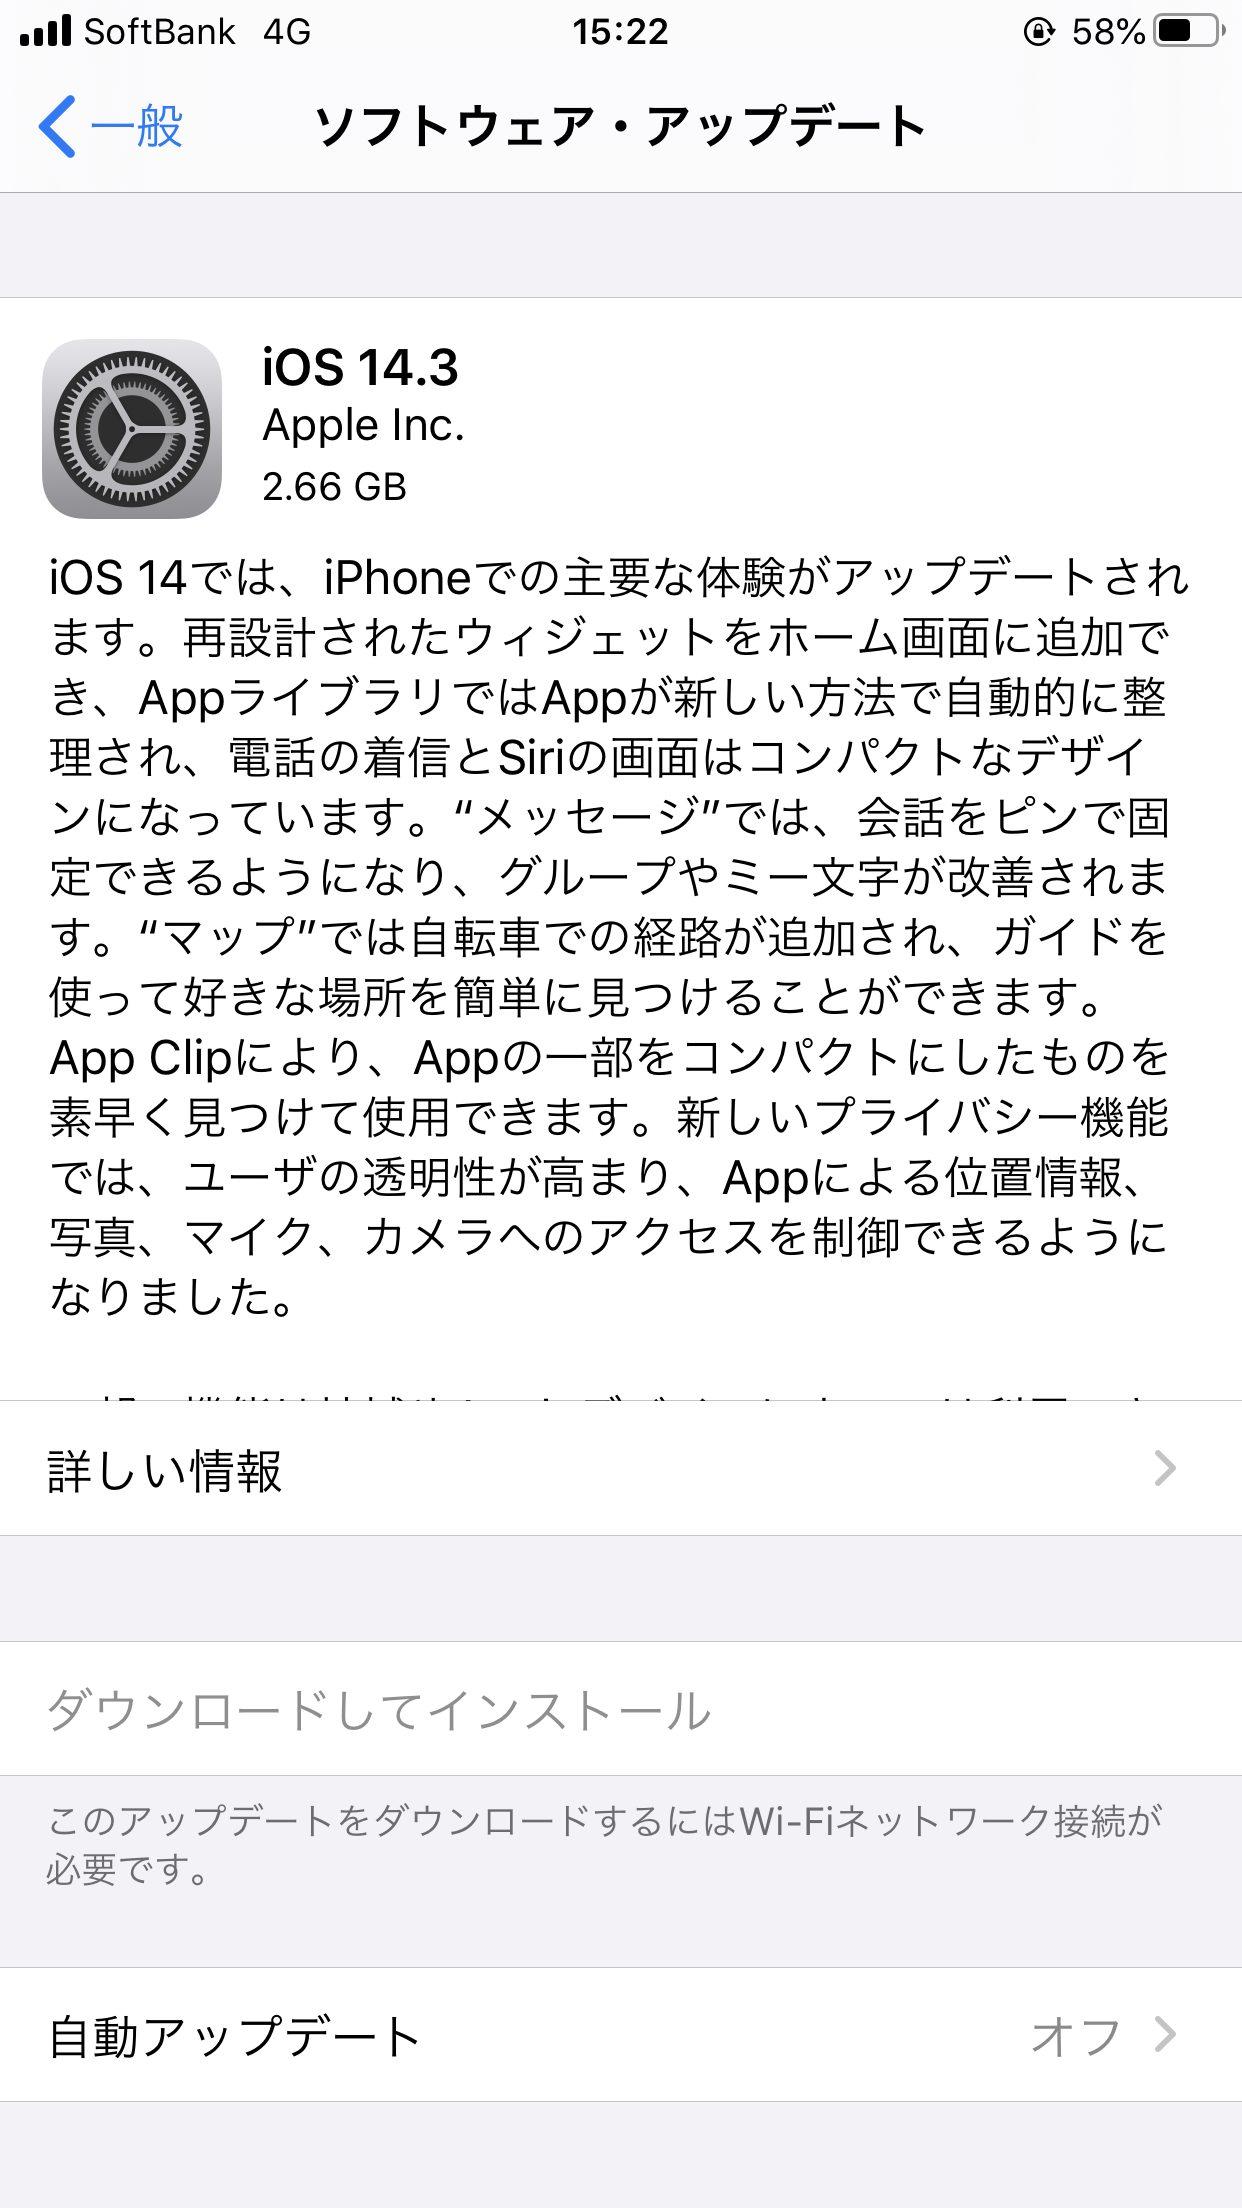 iPhoneのソフトウェアアップデート